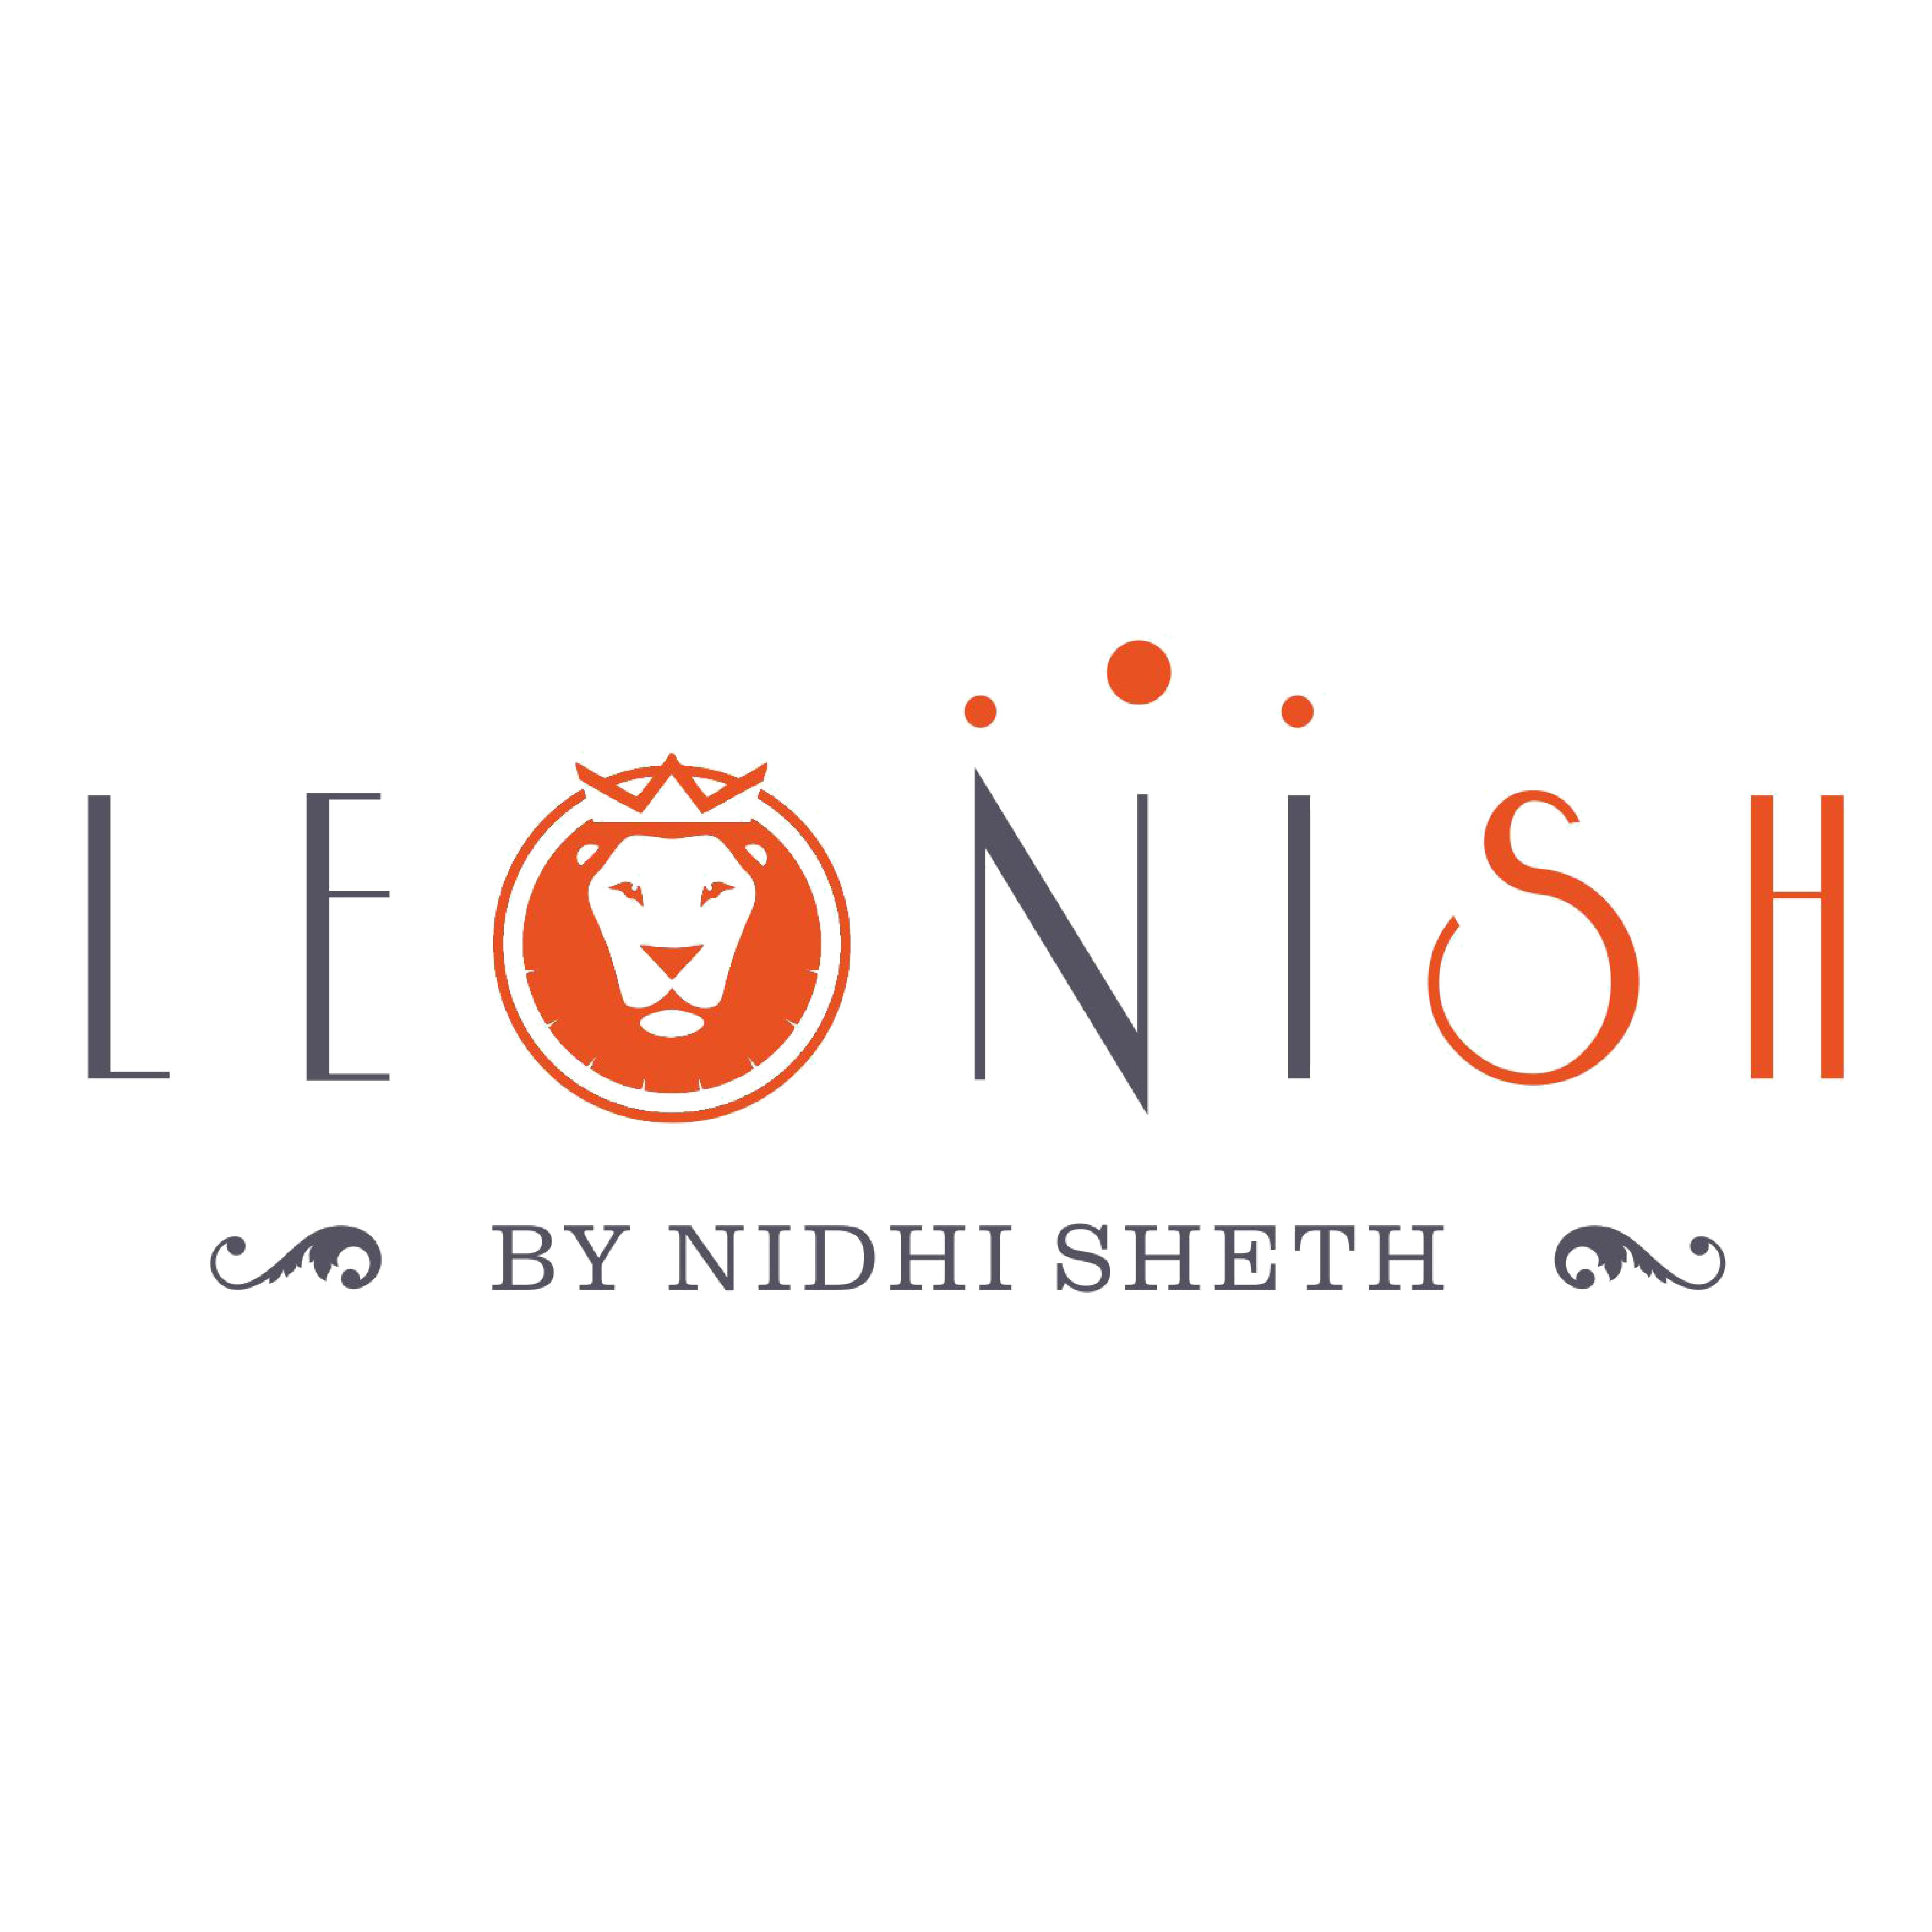 Leonish